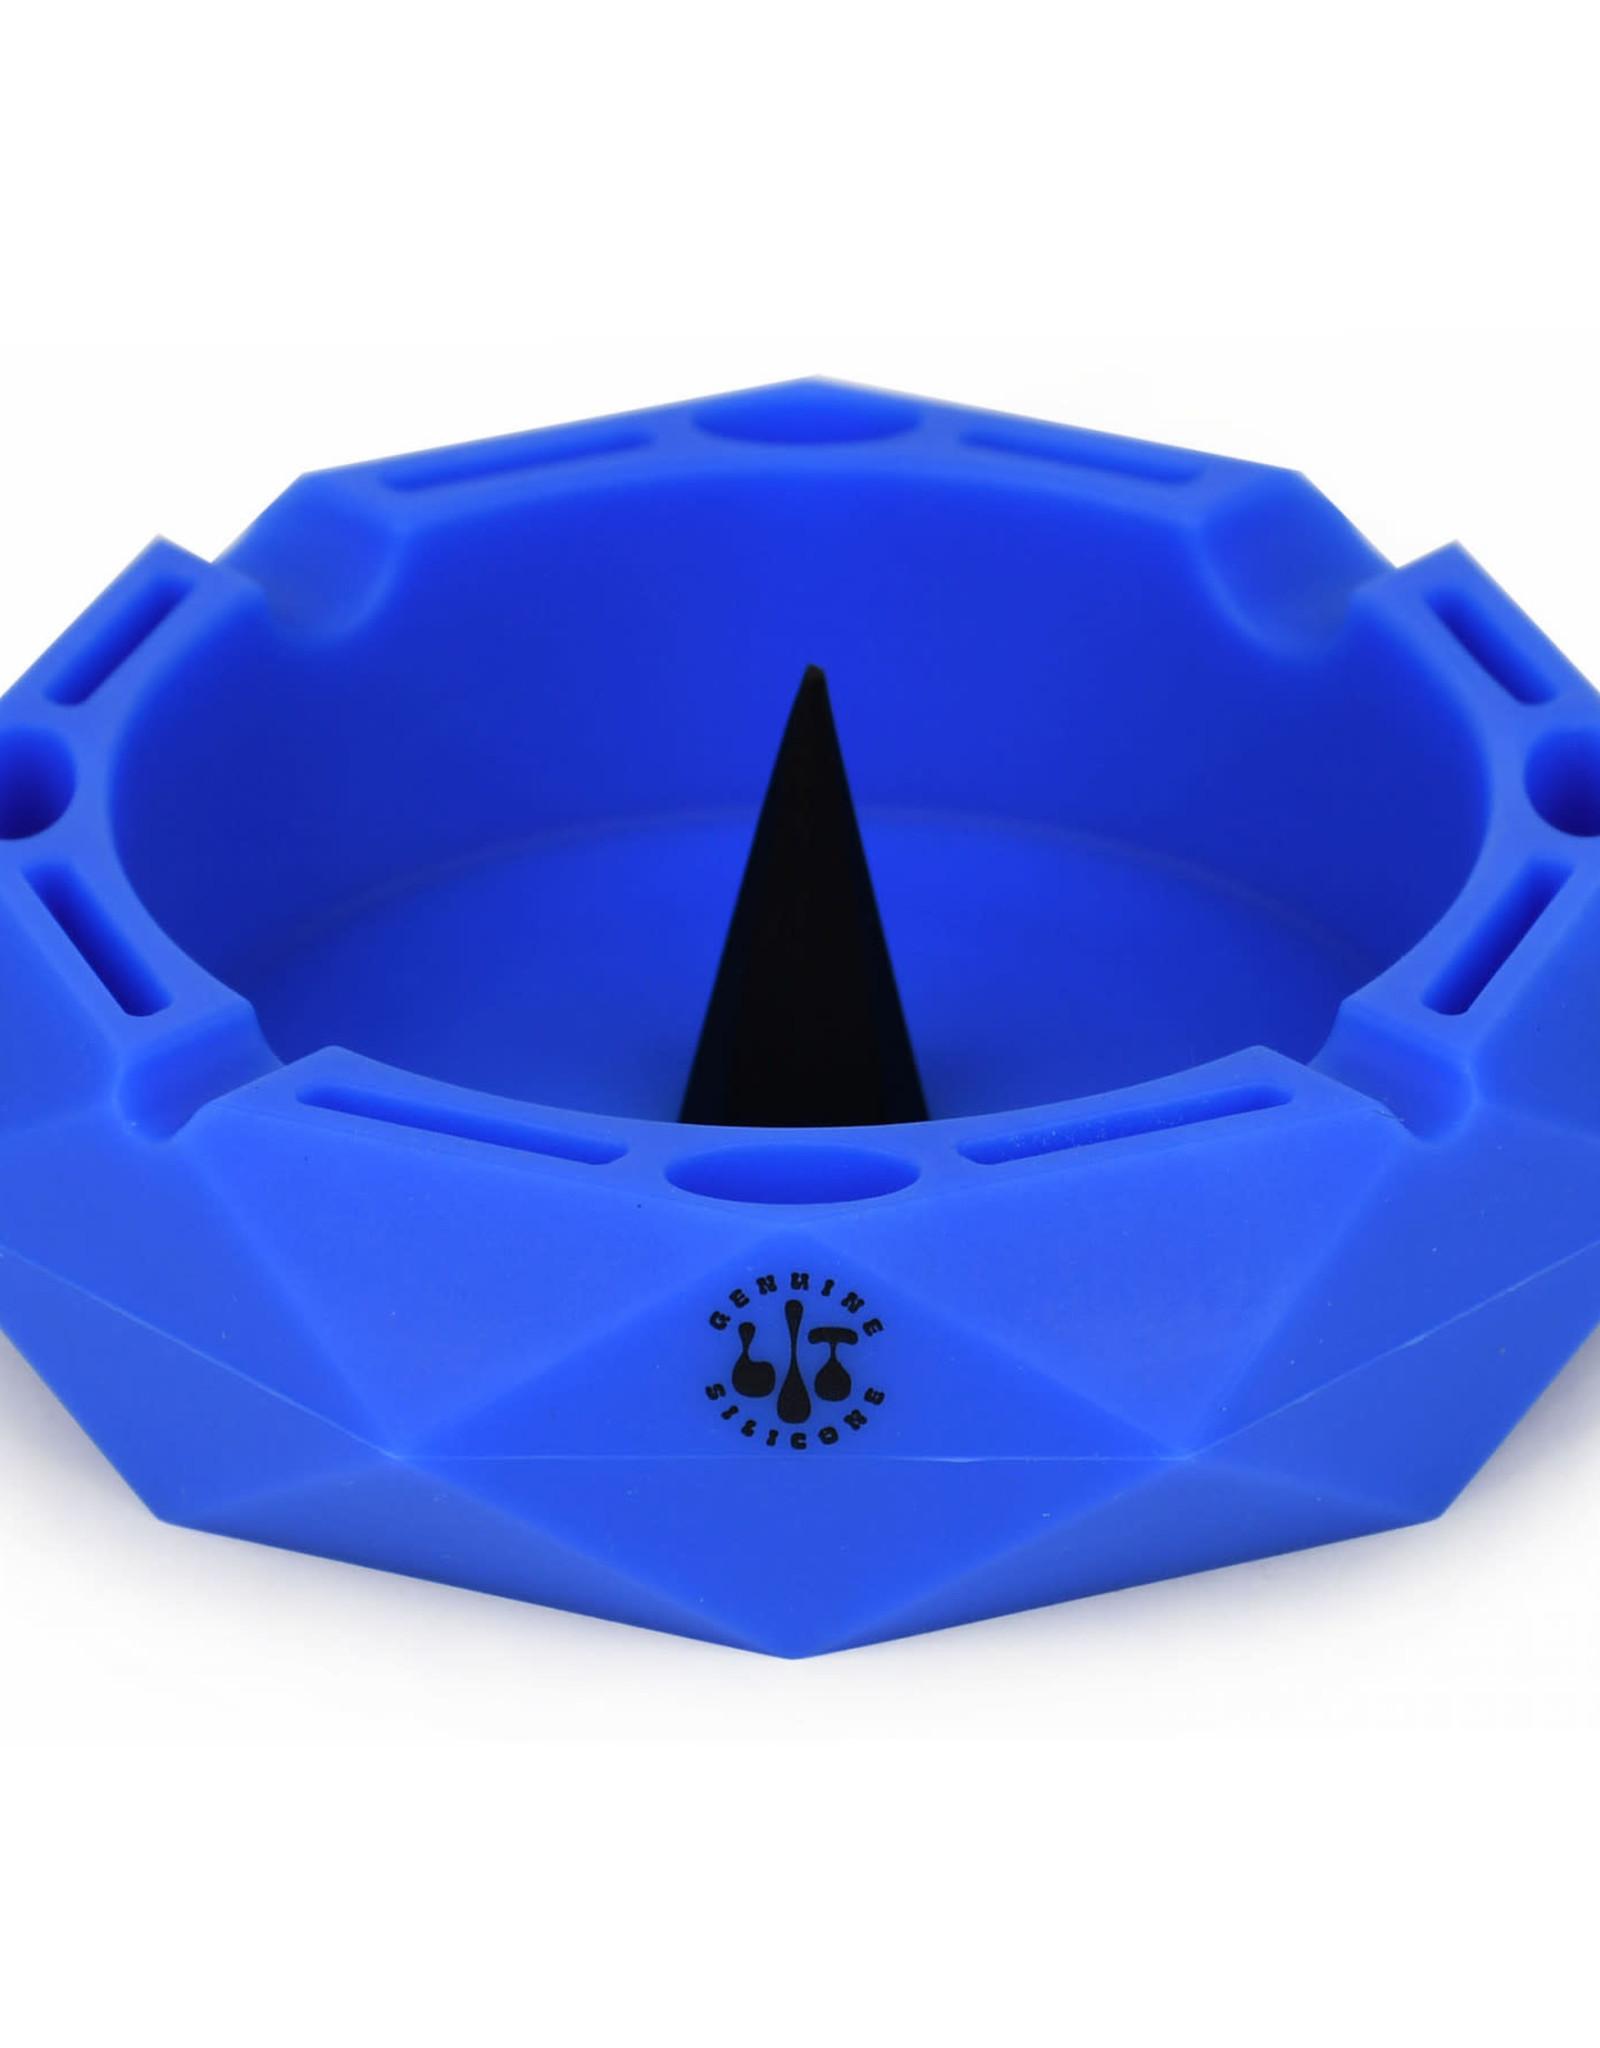 "ts64 5"" BLUE ROUND ASHTRAY W/ DEBOWLER"